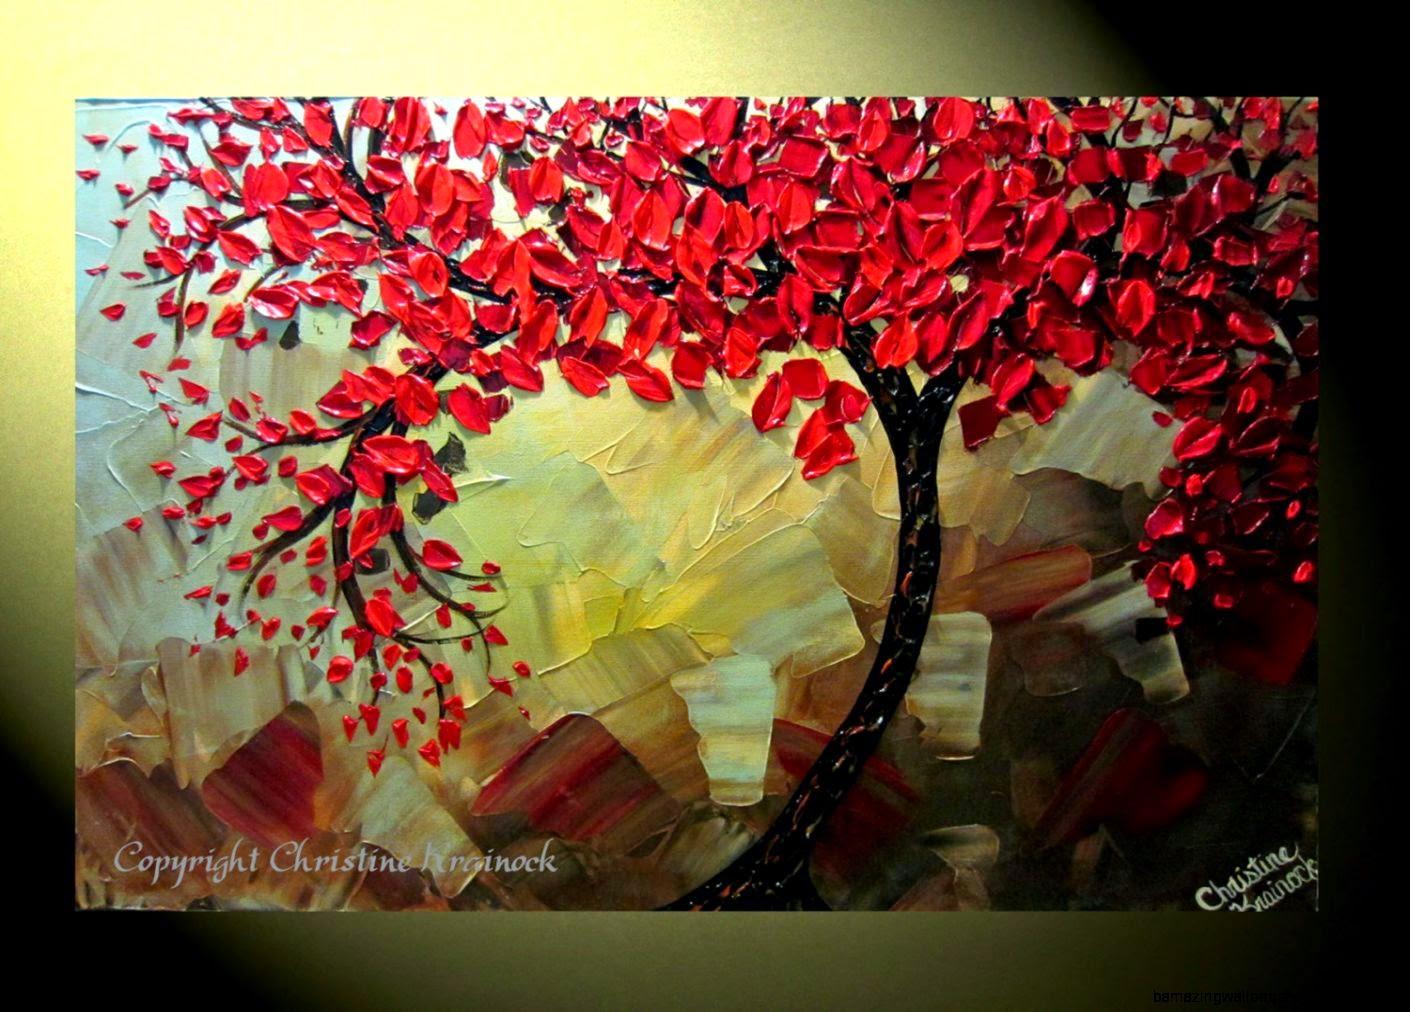 Original Abstract Tree Painting Textured Red by ChristineKrainock